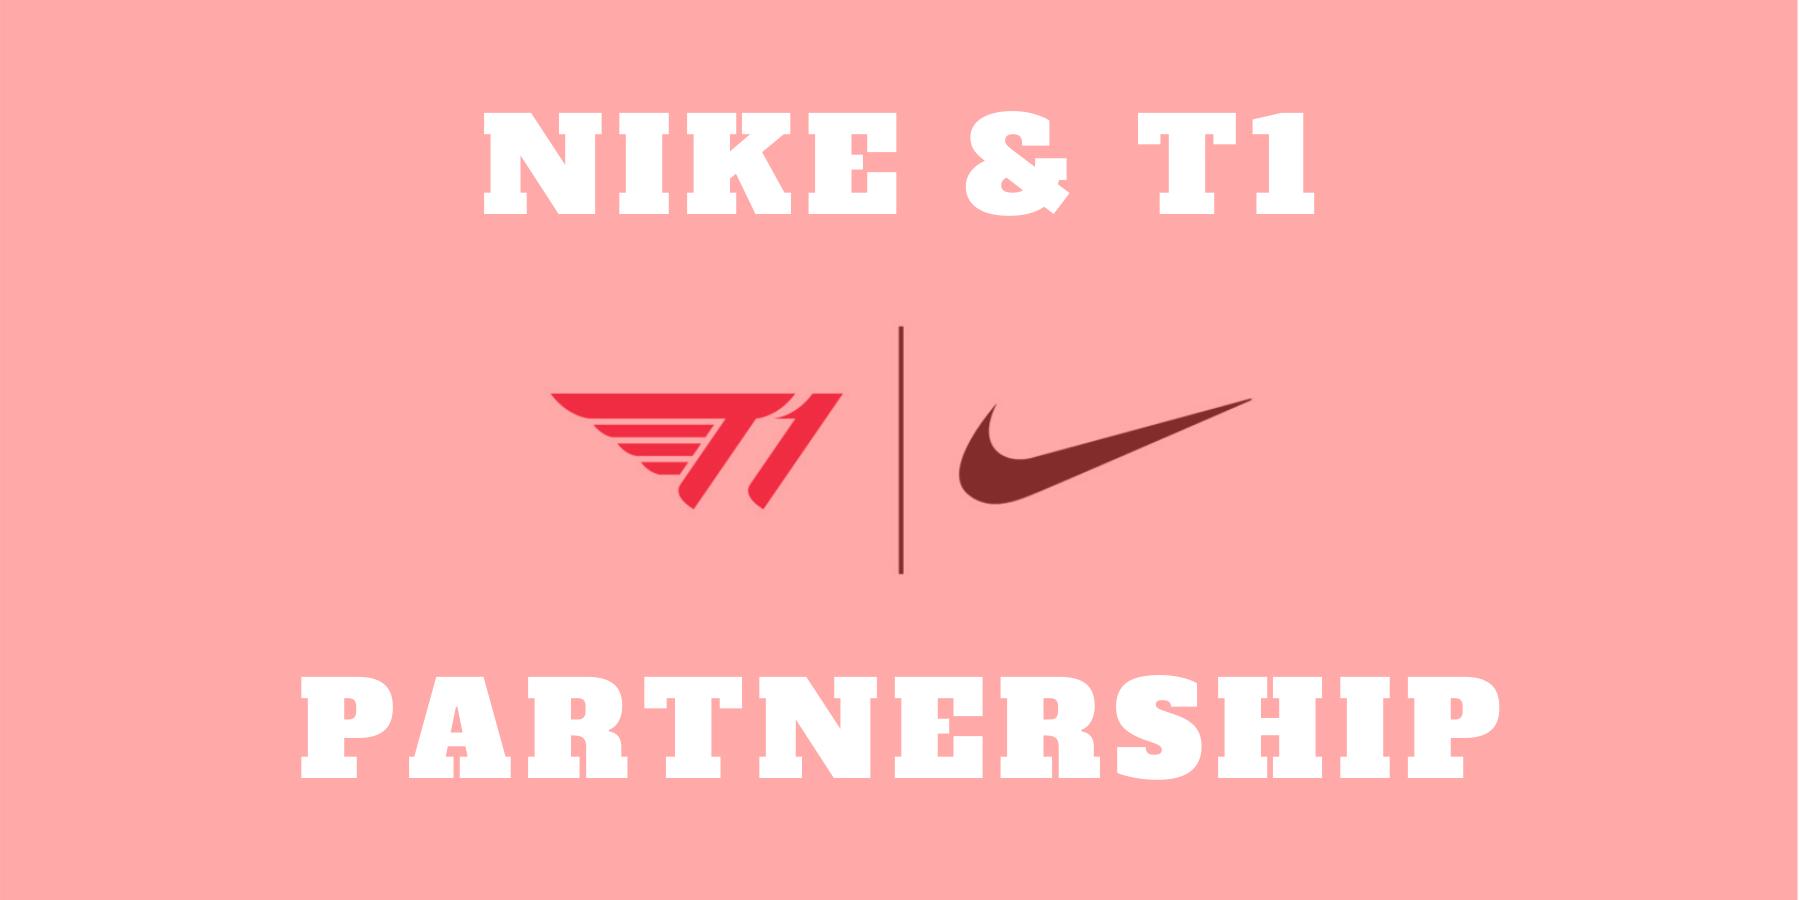 perdón Por cierto palo  Nike & T1 Partners To Support eSports In S. Korea - KoreaGameDesk - Korea's  Leading Game and Esports Media Publication